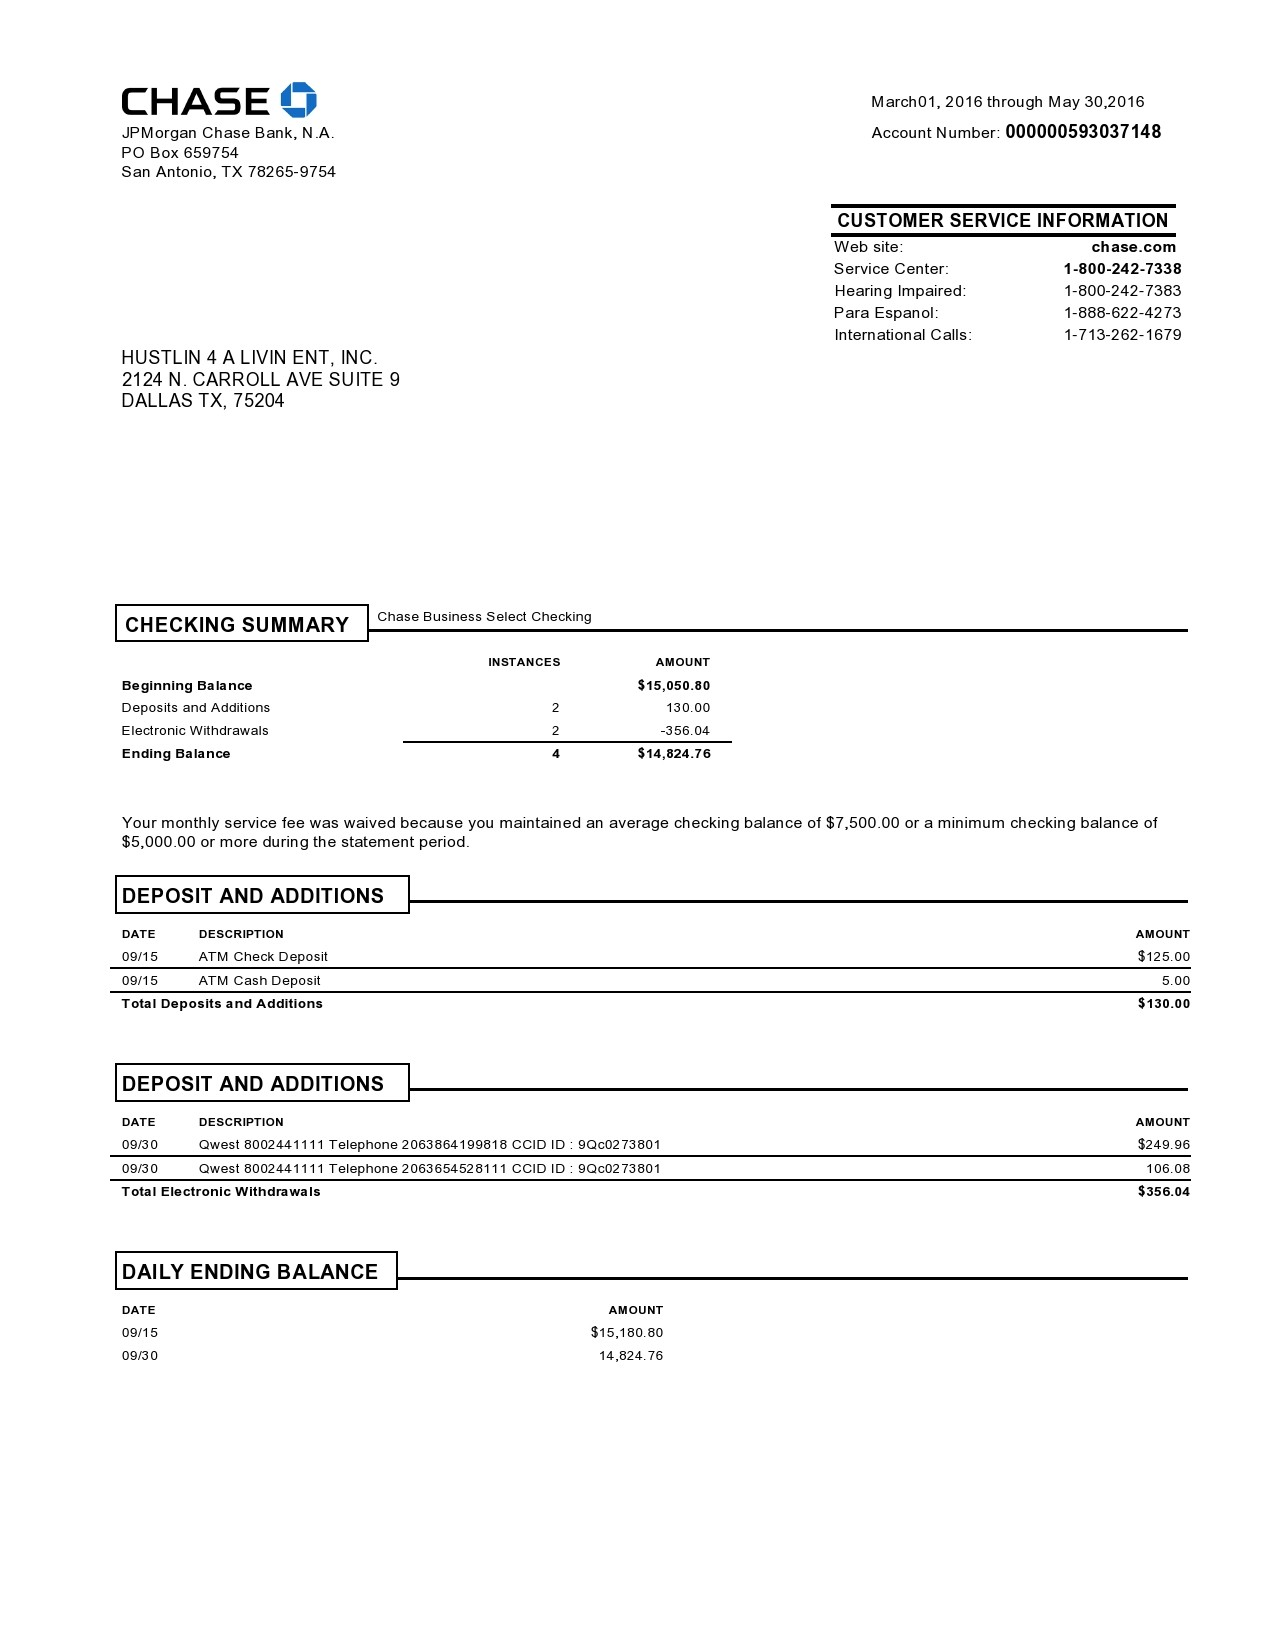 Free Chase Bank Statement - TemplateLab.com